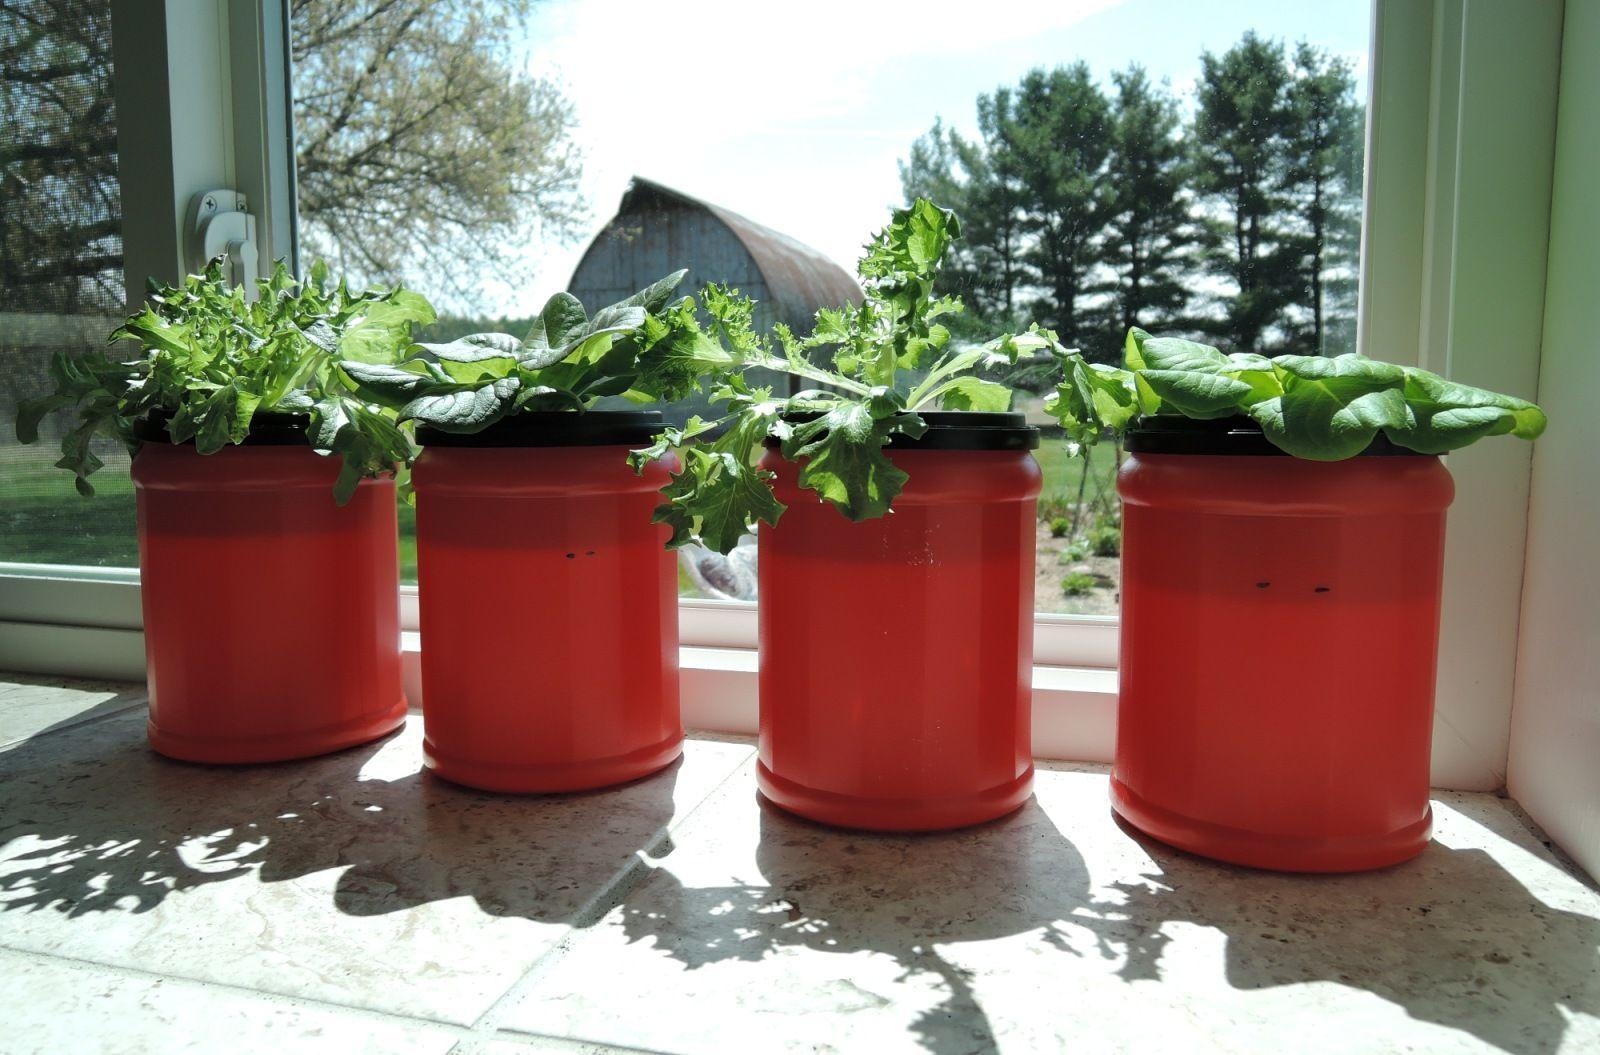 Growing lettuce cheap hydroponics diy hydroponicslettuce